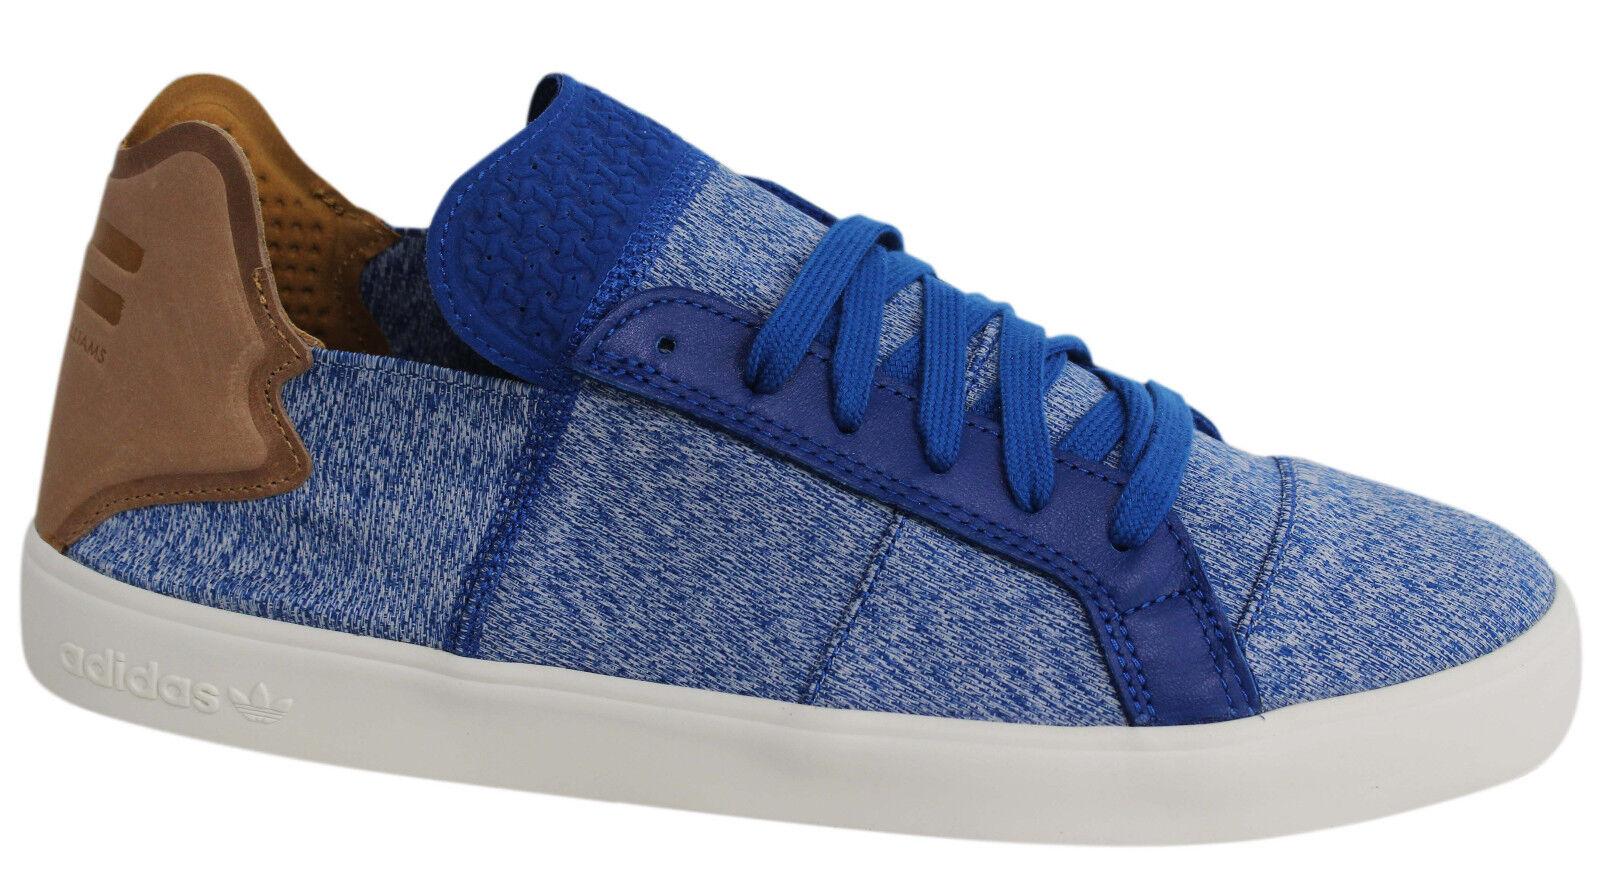 Adidas Originals Lace Up Pharrell Williams bluee Mens Trainers AQ5779 U13